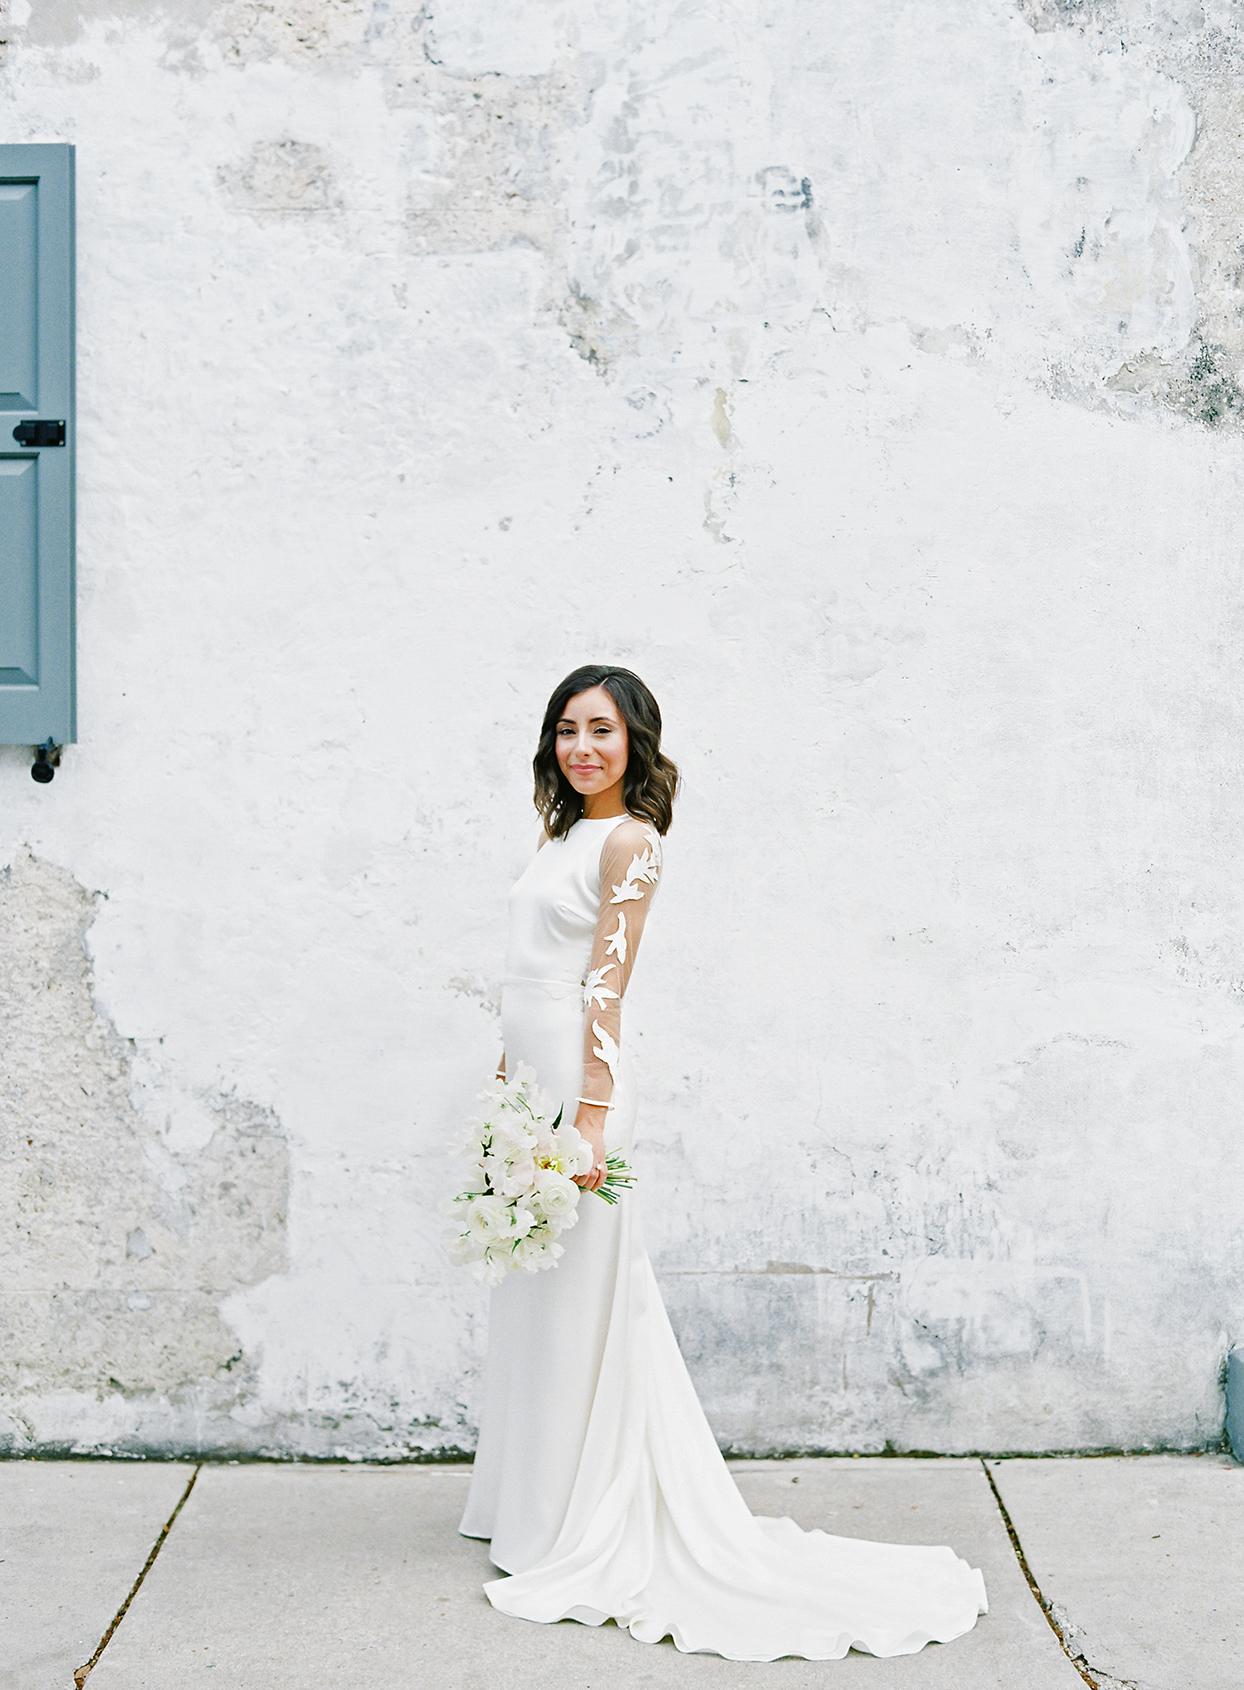 paula terence wedding bride against rough wall